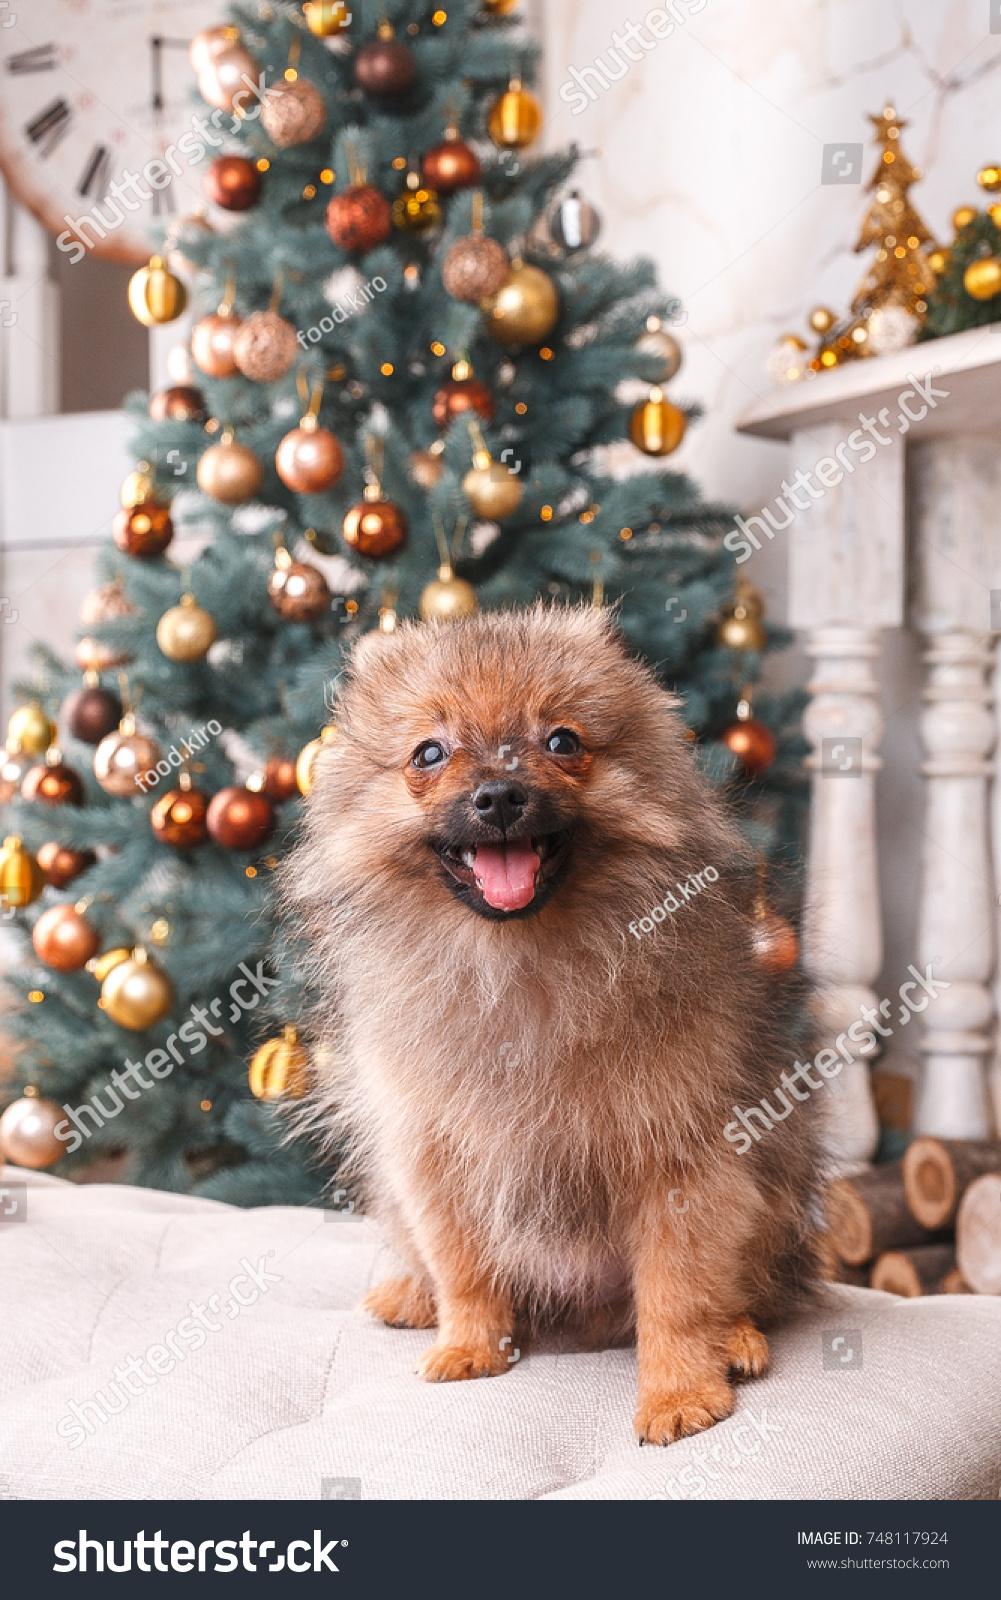 Small Cute Funny Pomeranian Dog Sitting Stock Photo Edit Now